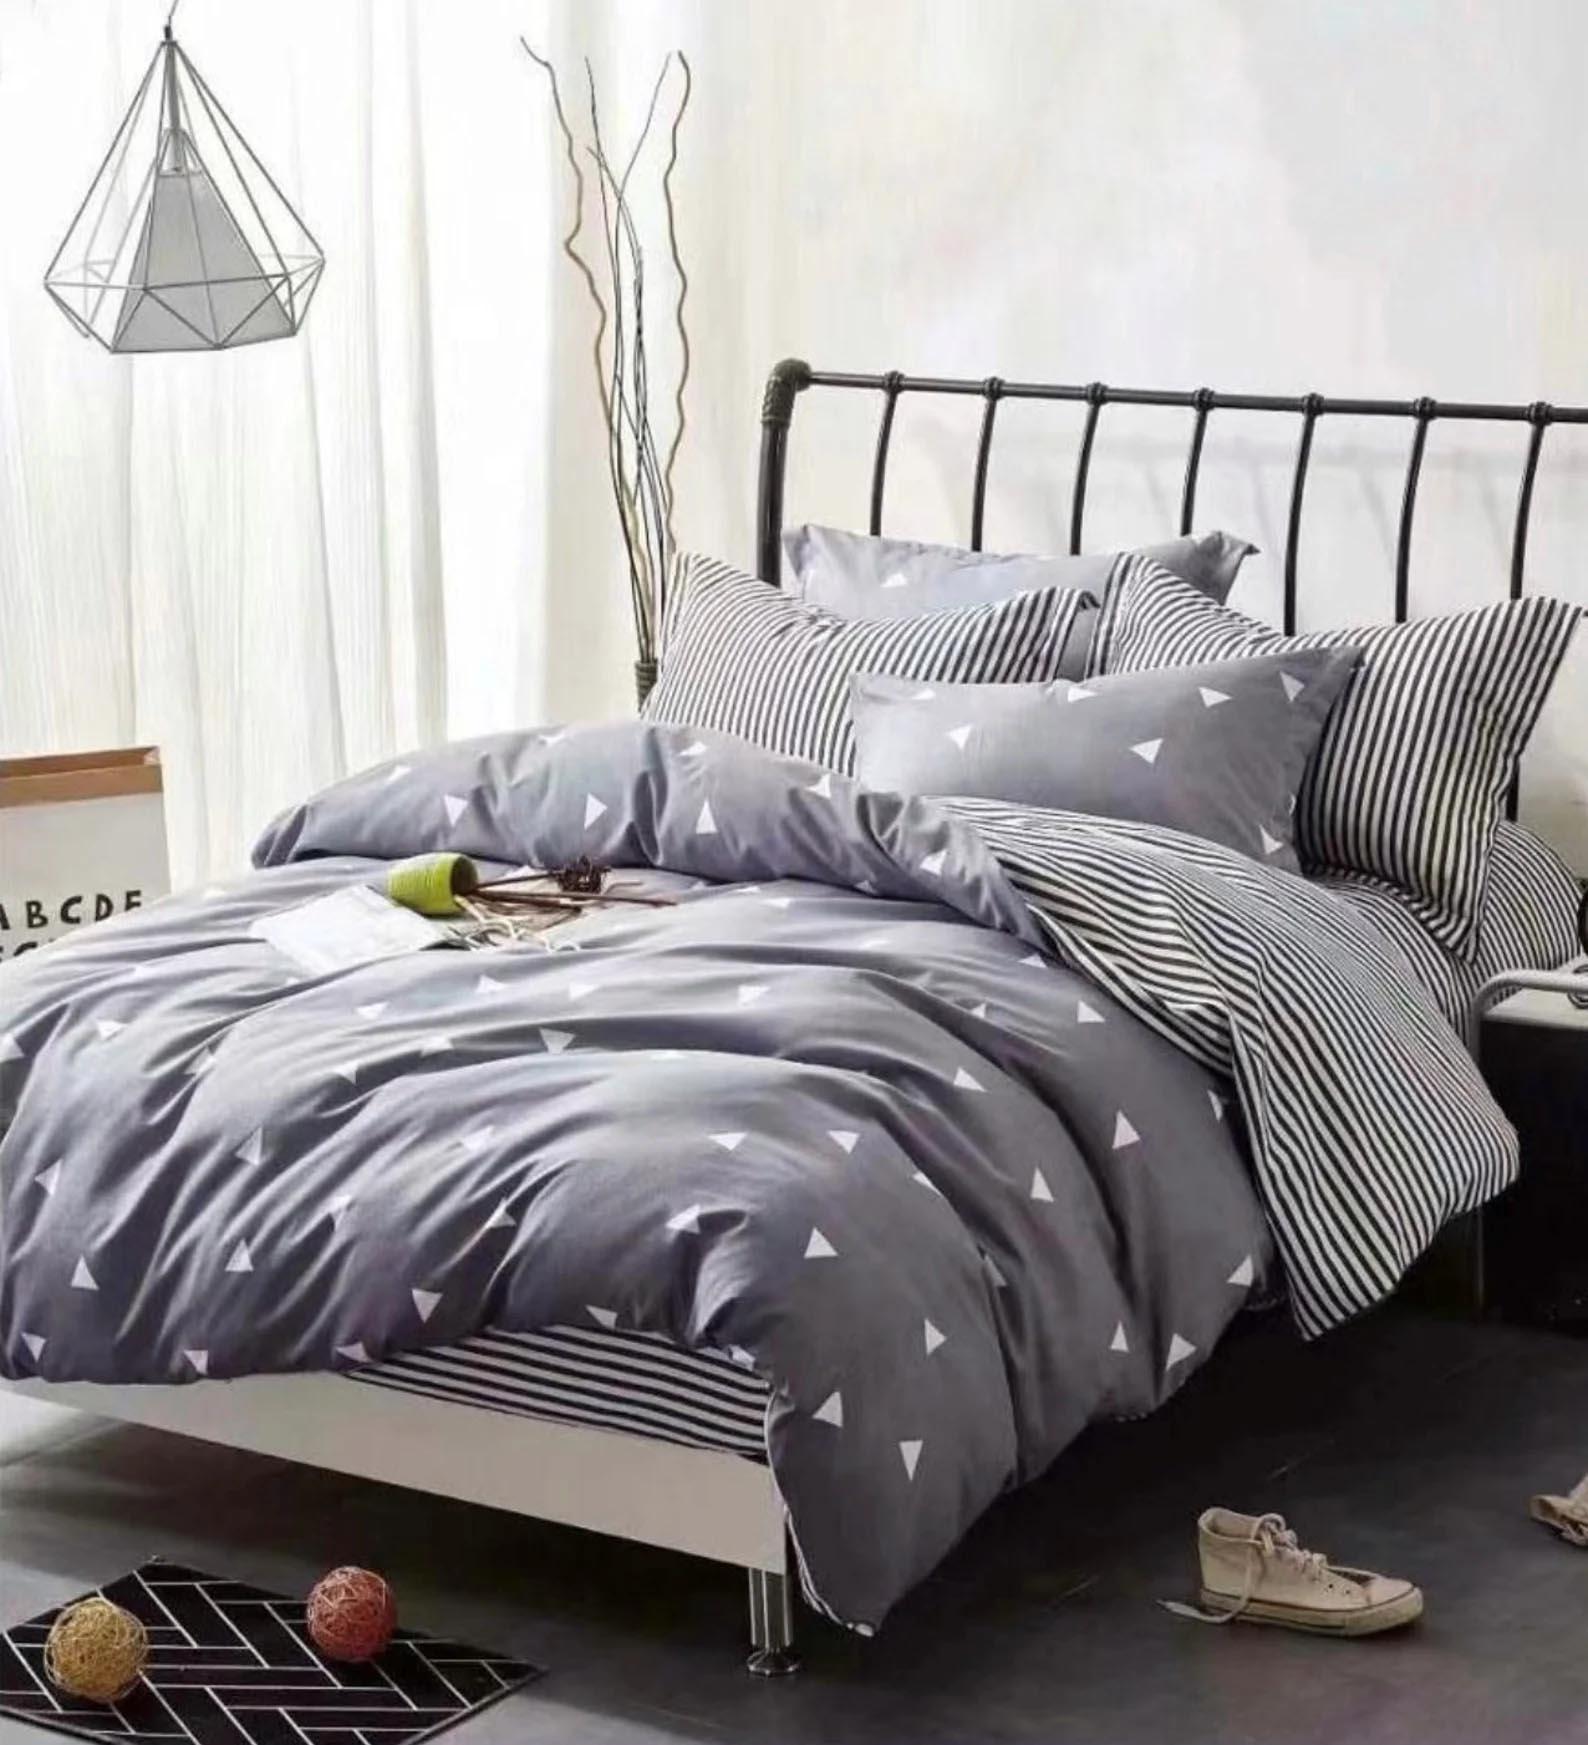 Modern Bedroom Decor - Geometric gray and white bedding.